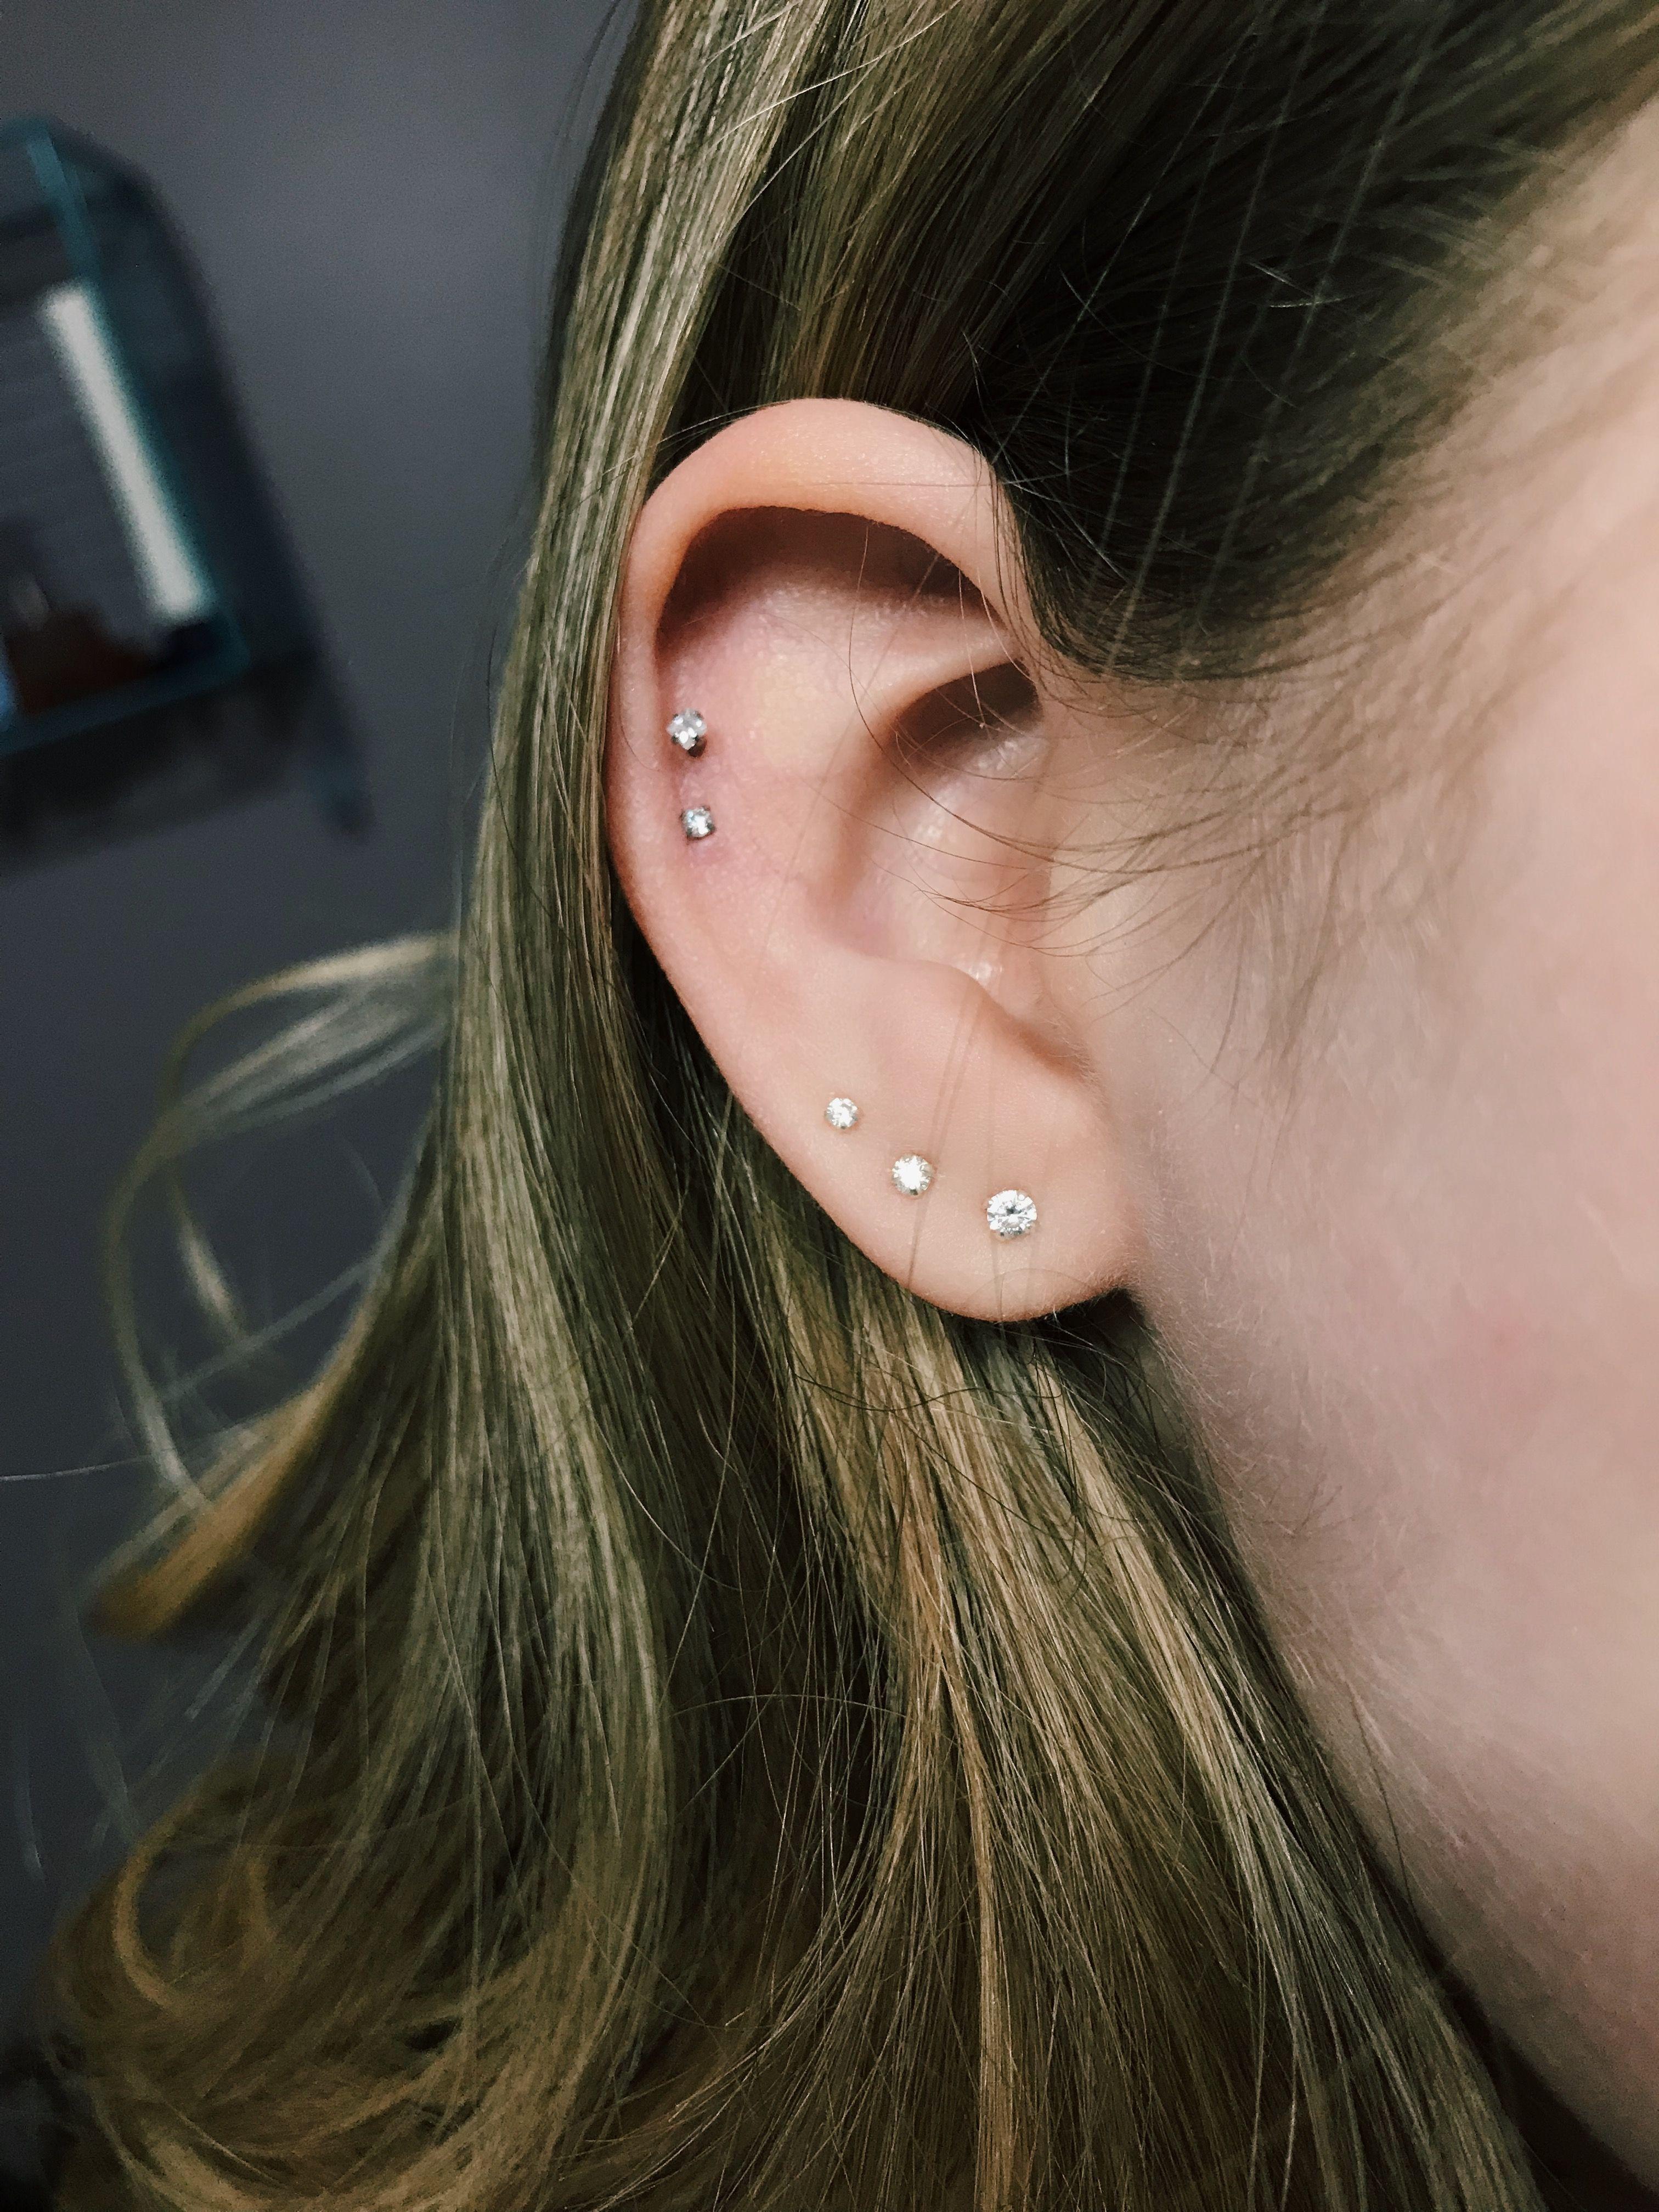 29b0f011ac712 dainty ear piercings | Piercings in 2019 | Ear piercings, Piercings ...